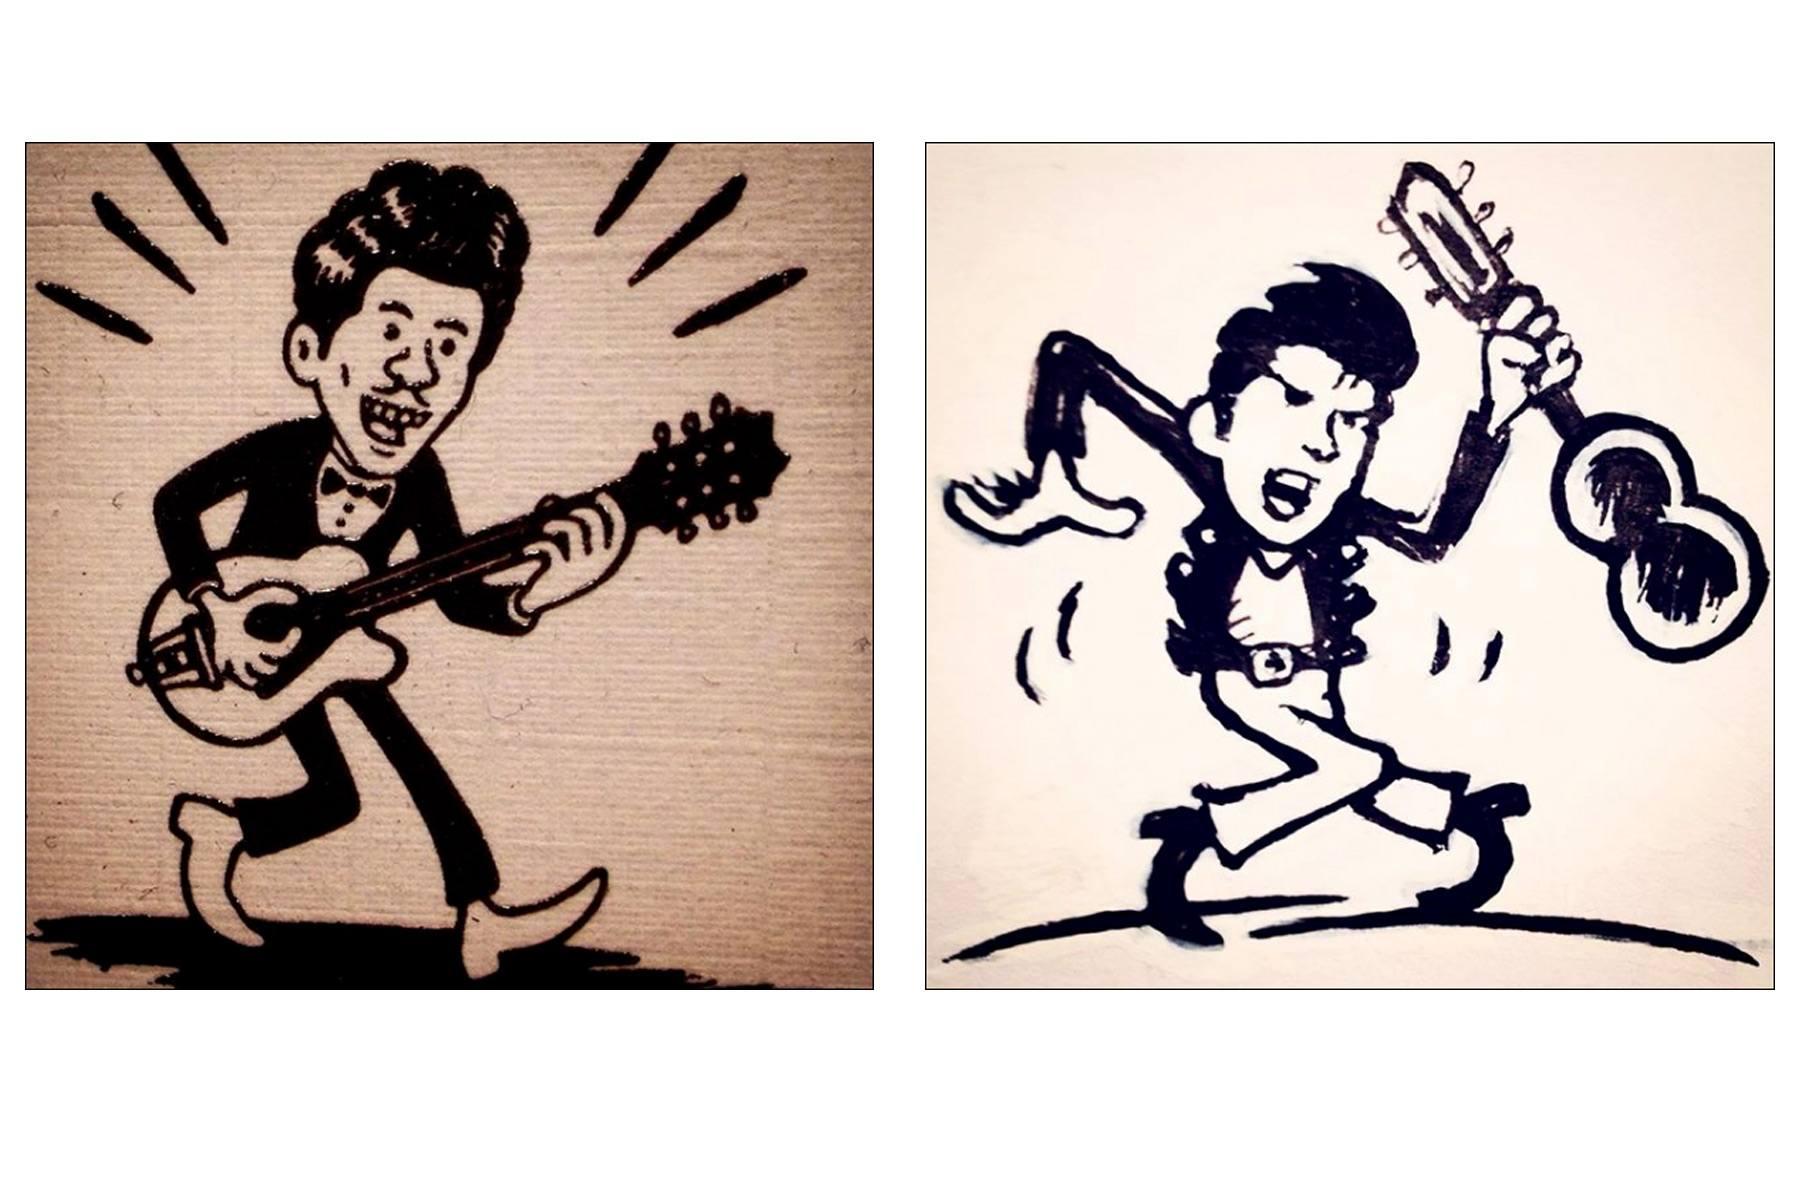 Chuck Berry drawing by Avi Spivak. Ponyboy magazine.